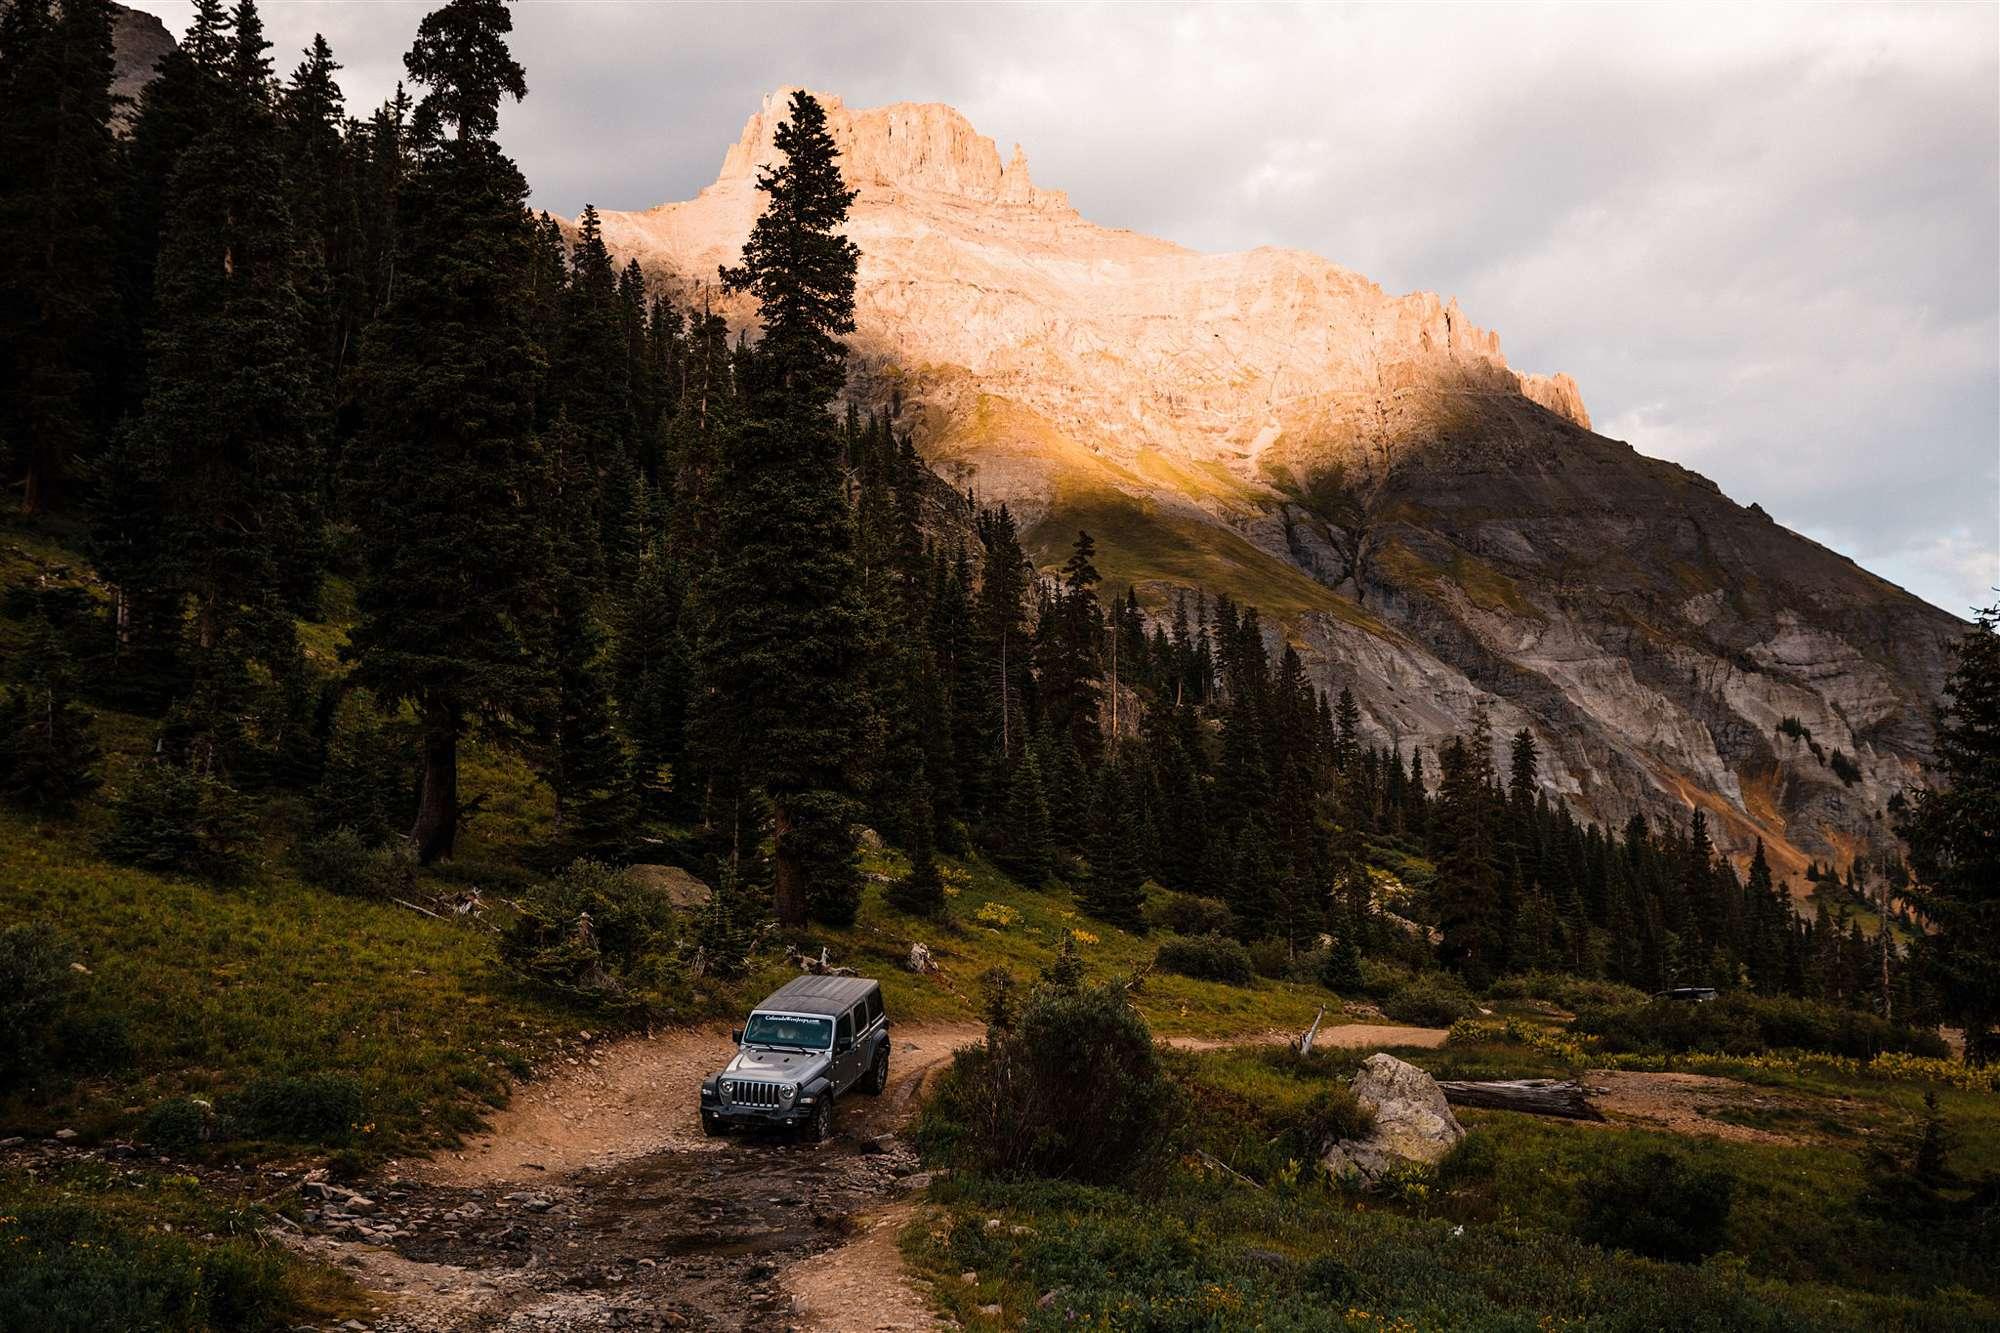 Colorado_Jeeping_Elopement_Emily_Matt_The_Foxes_Photography_0041.jpg